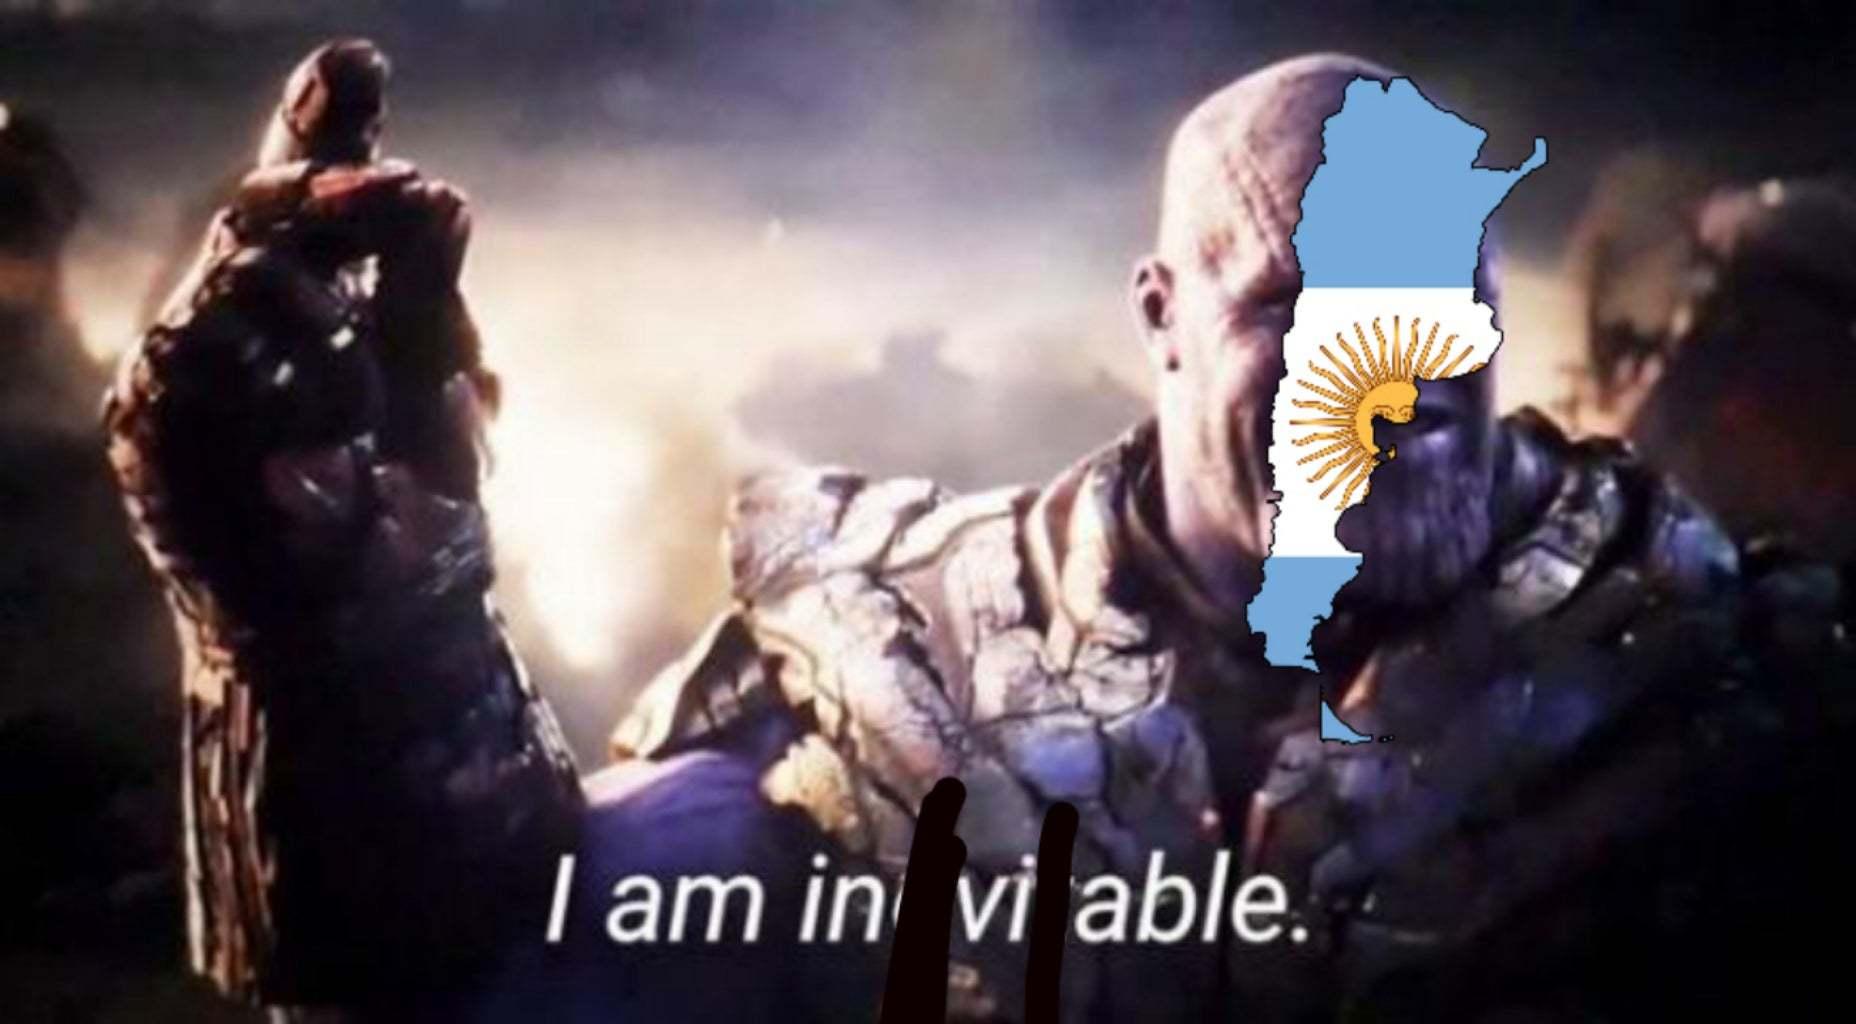 Híper de Alfonsín HERE WE GO! - meme